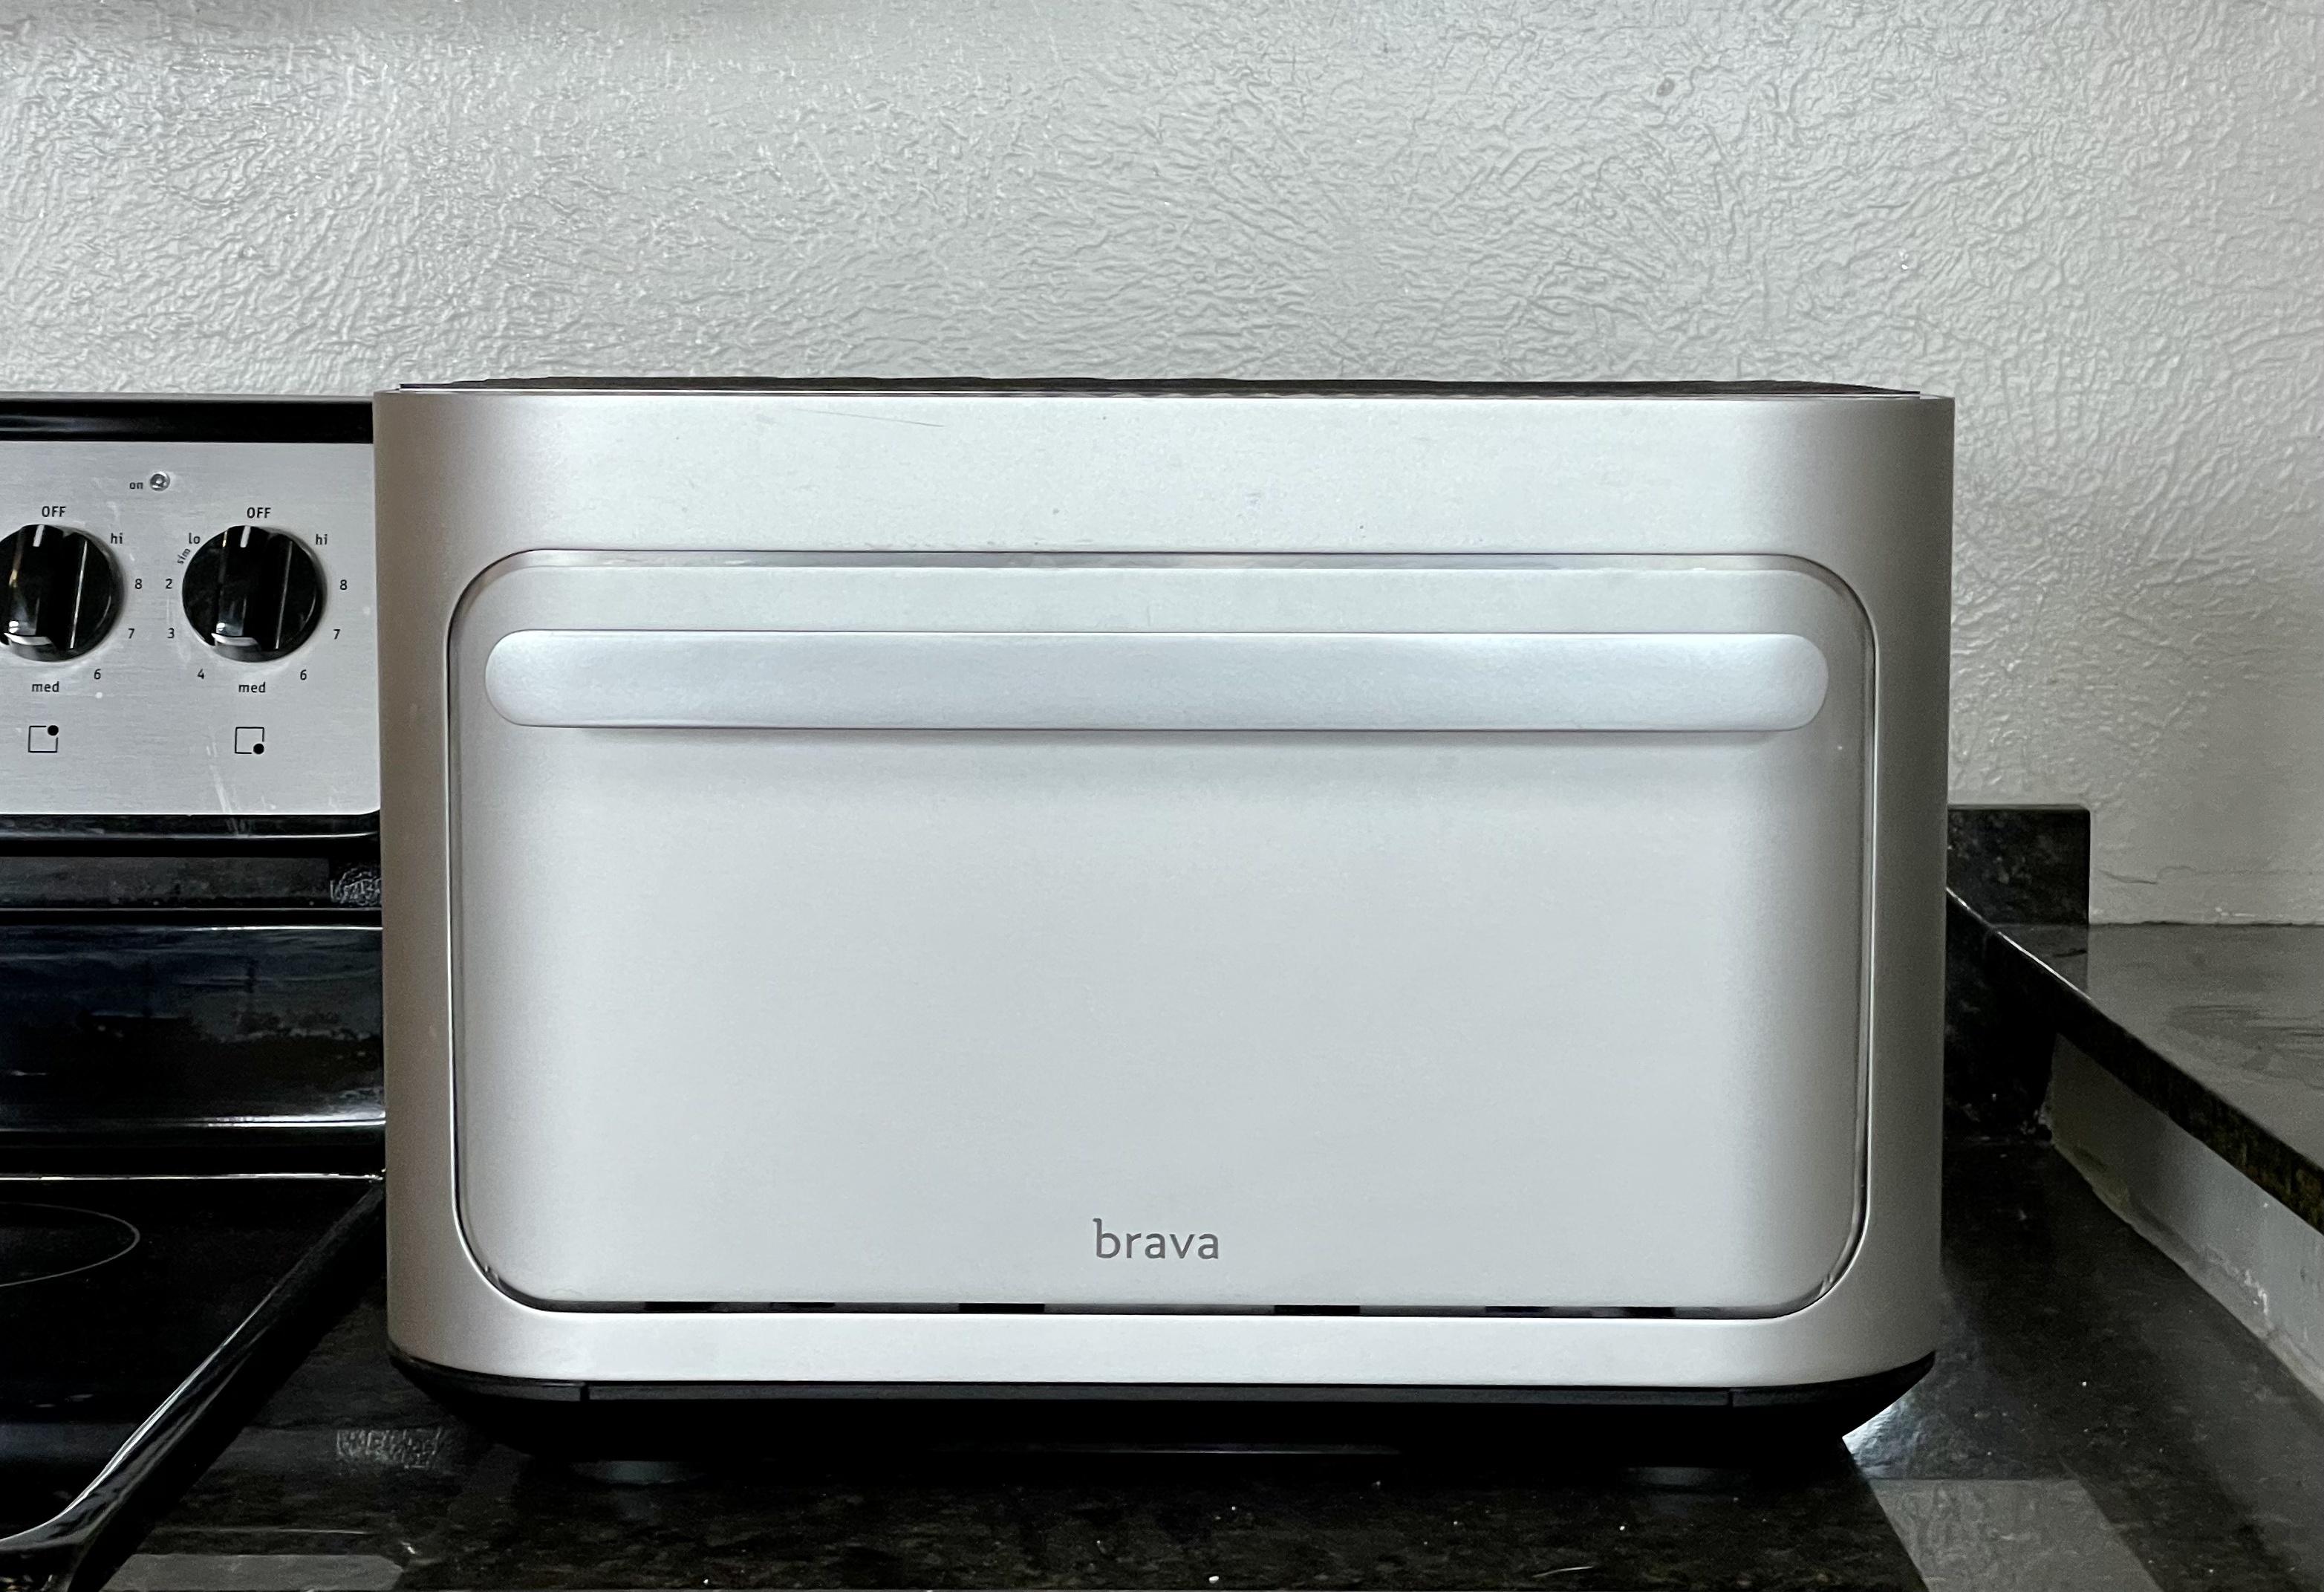 Brava Smart Oven Review